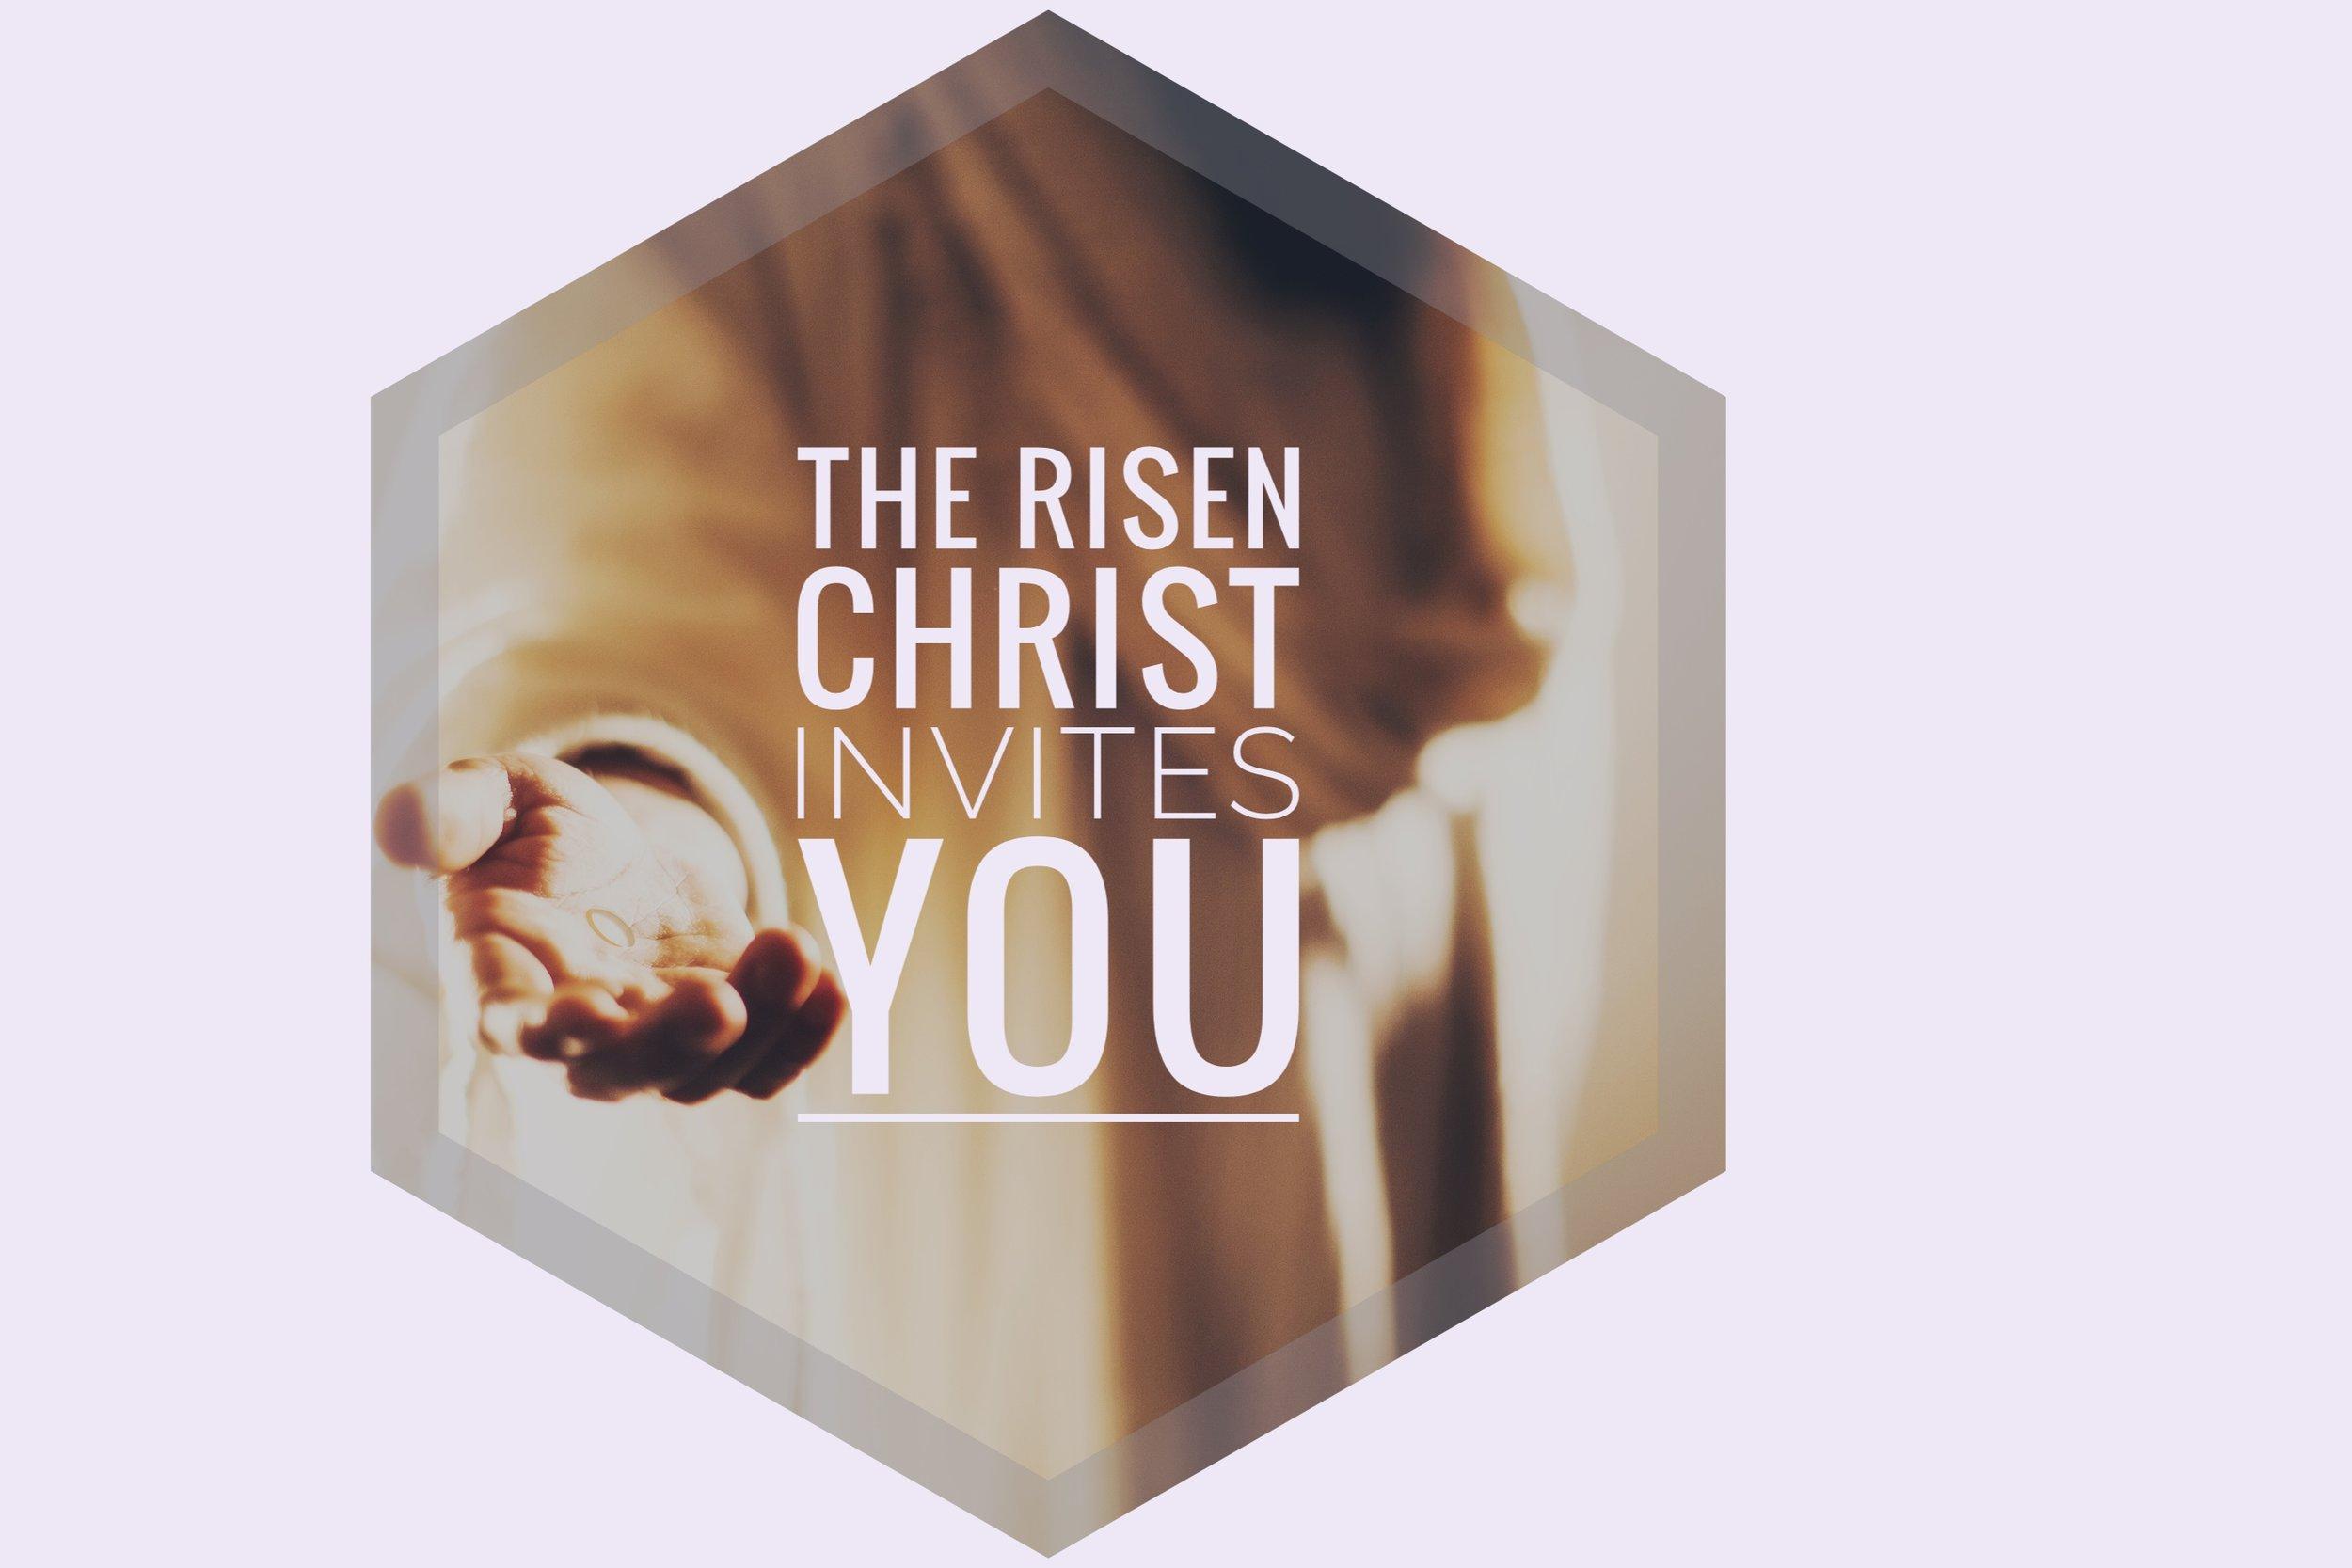 the risen Jesus invites you 05.05.19.jpeg